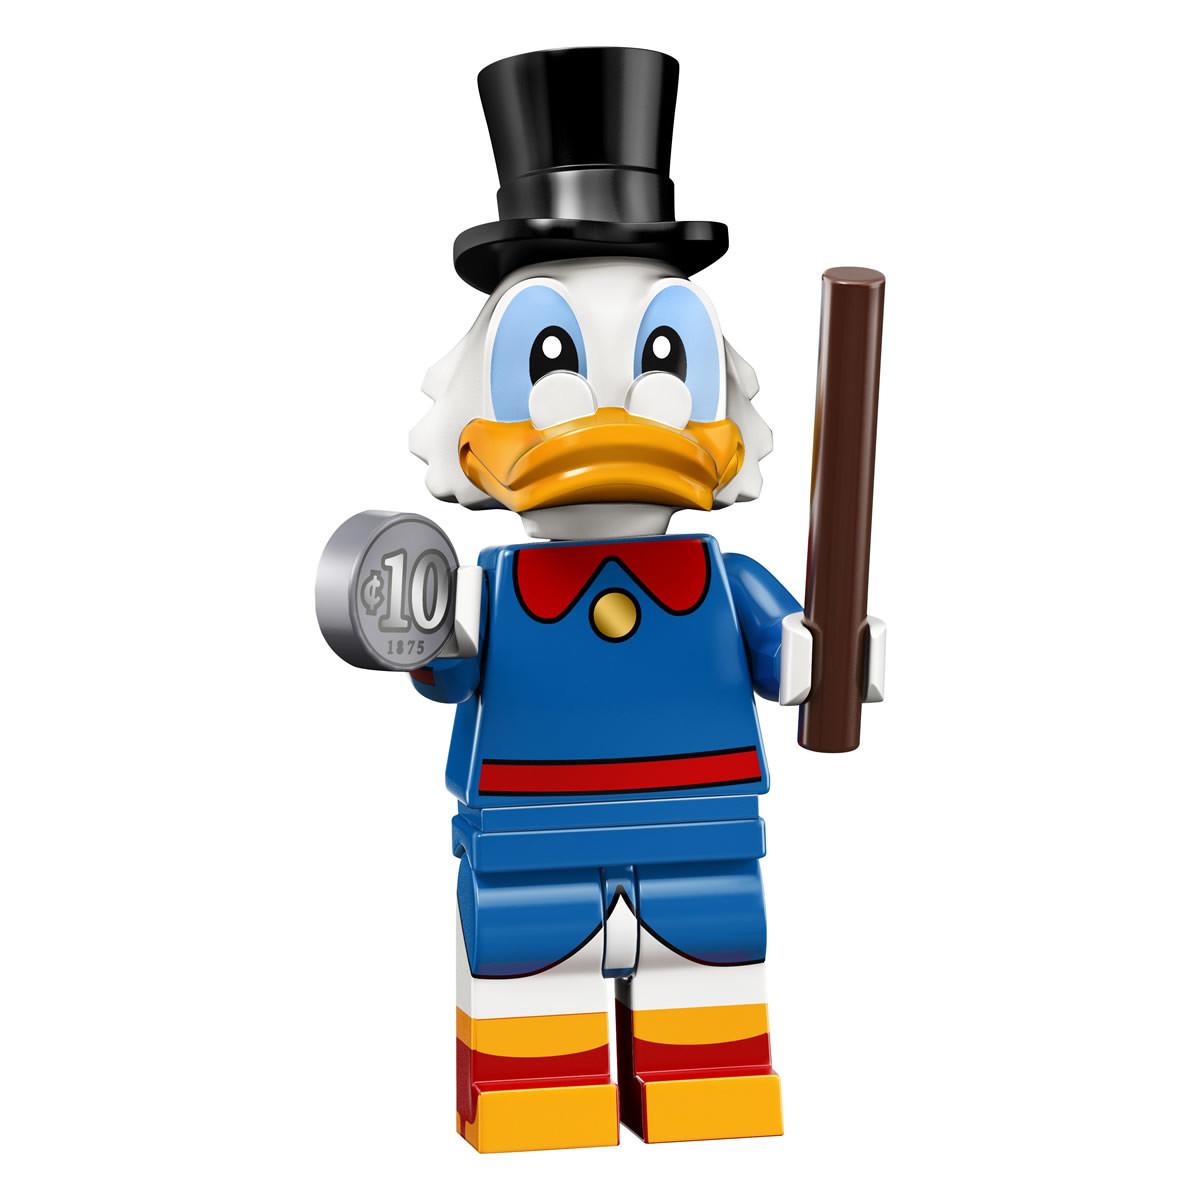 LEGO DISNEY SERIES 2 VINTAGE MICKEY /& MINNIE MOUSE MINIFIGURES 71024